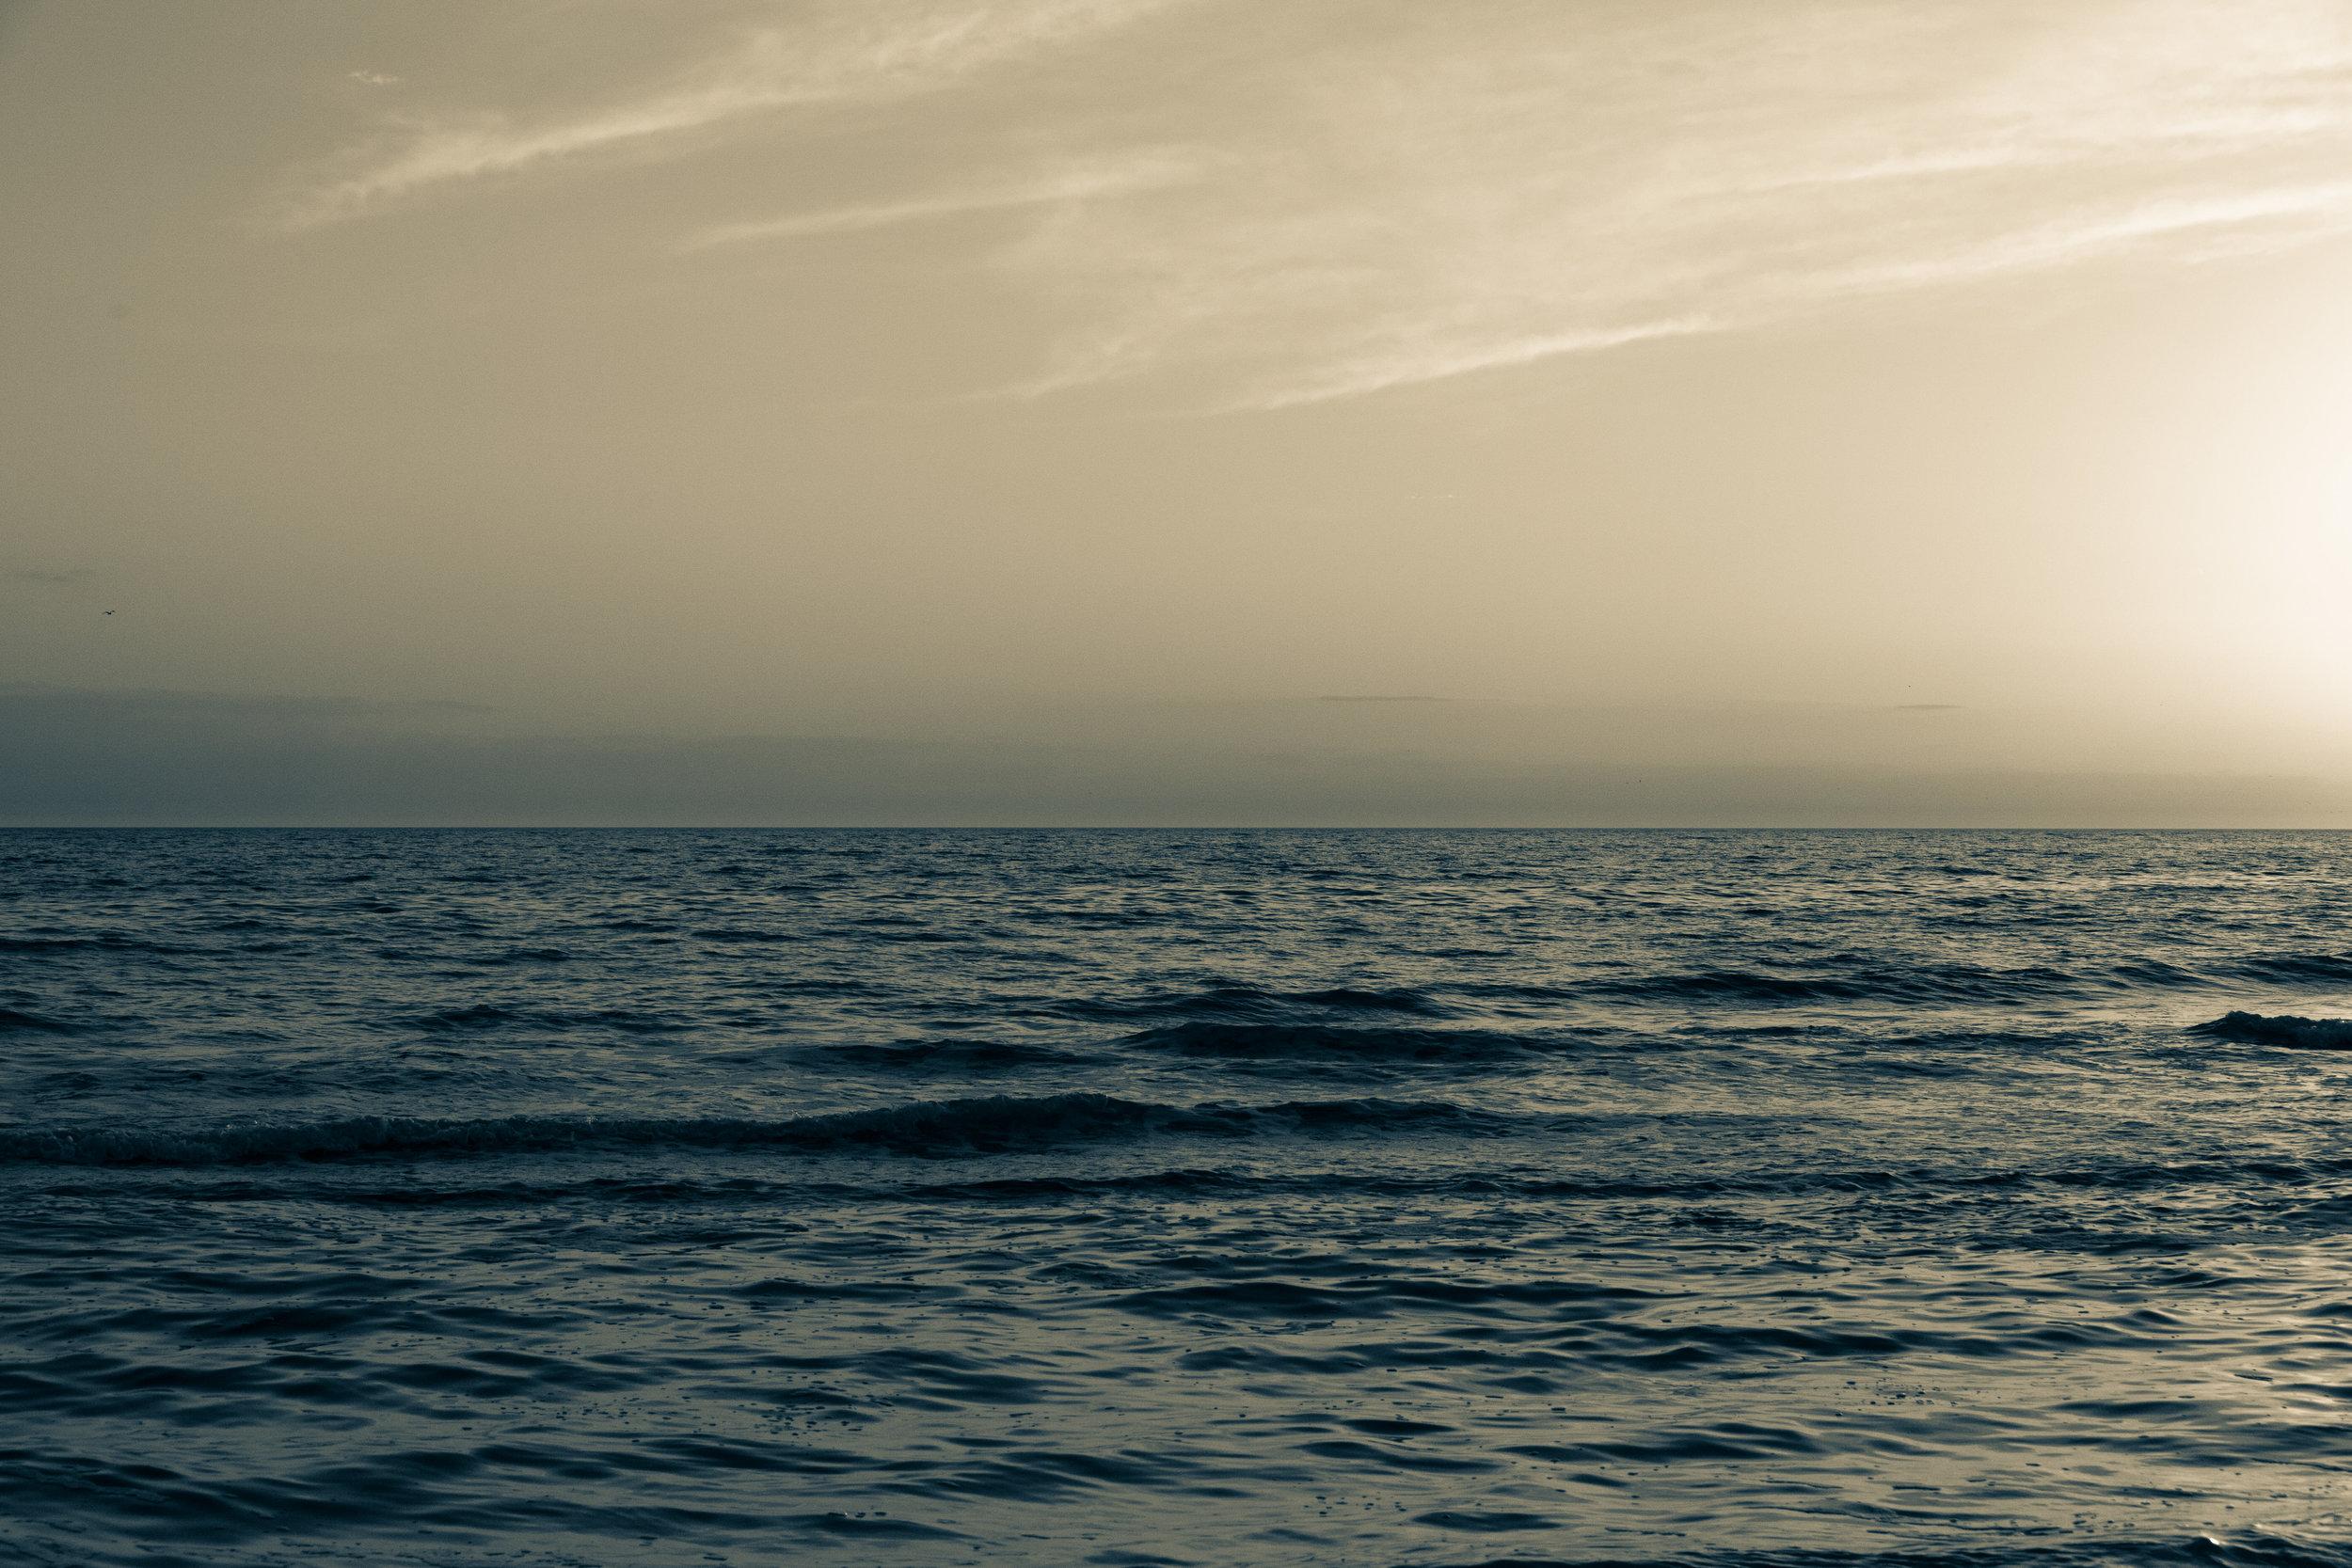 meditation-ocean-1303-9052-smugmug.jpg